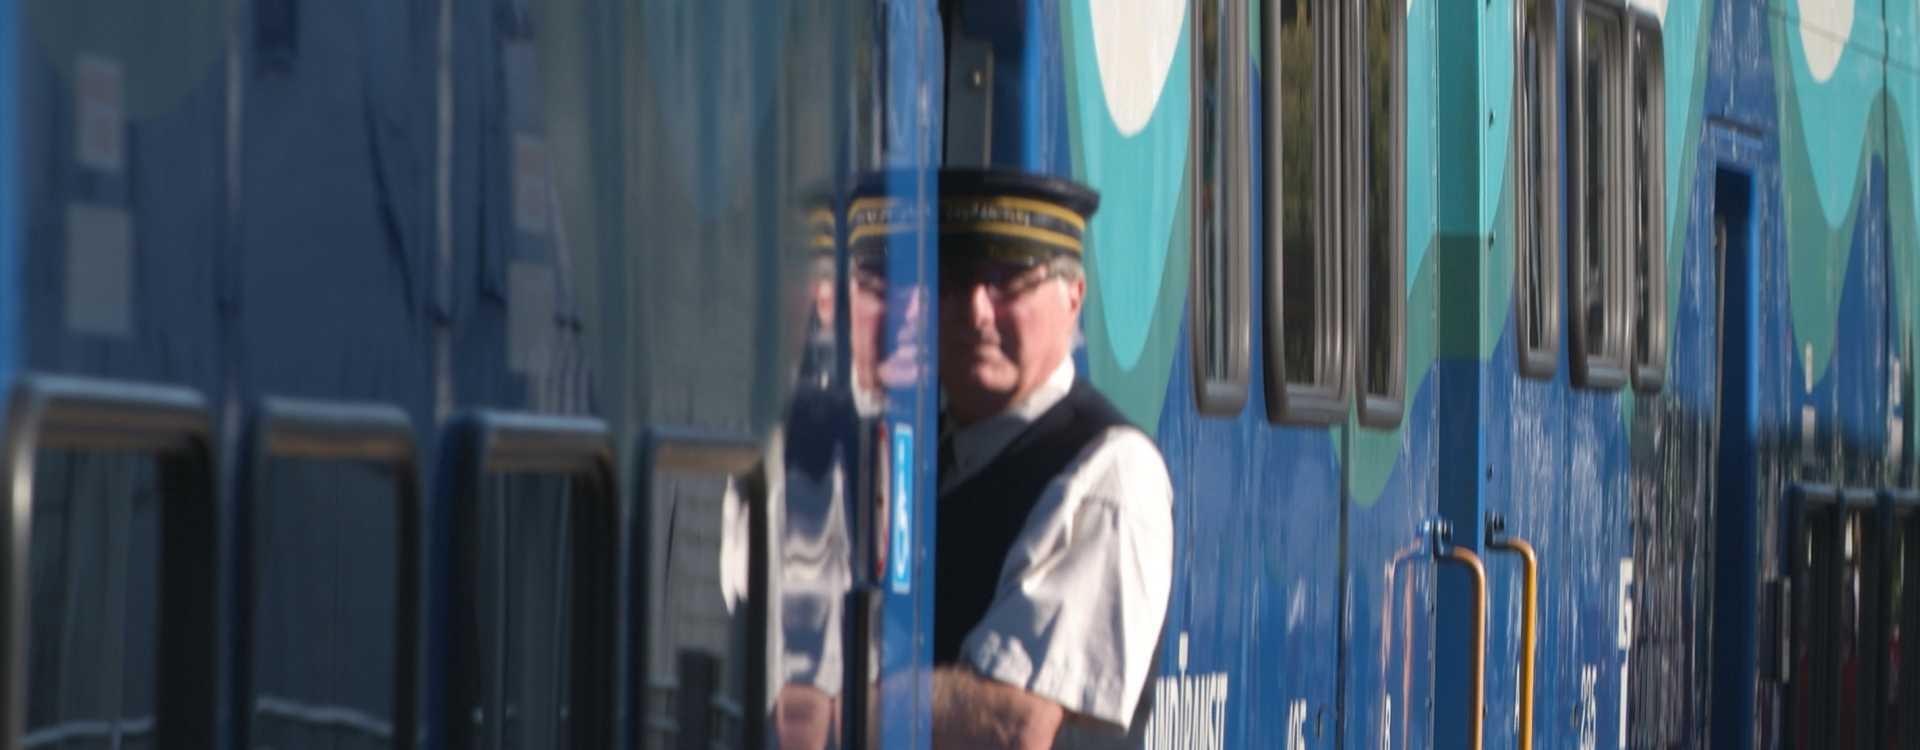 Sounder Train